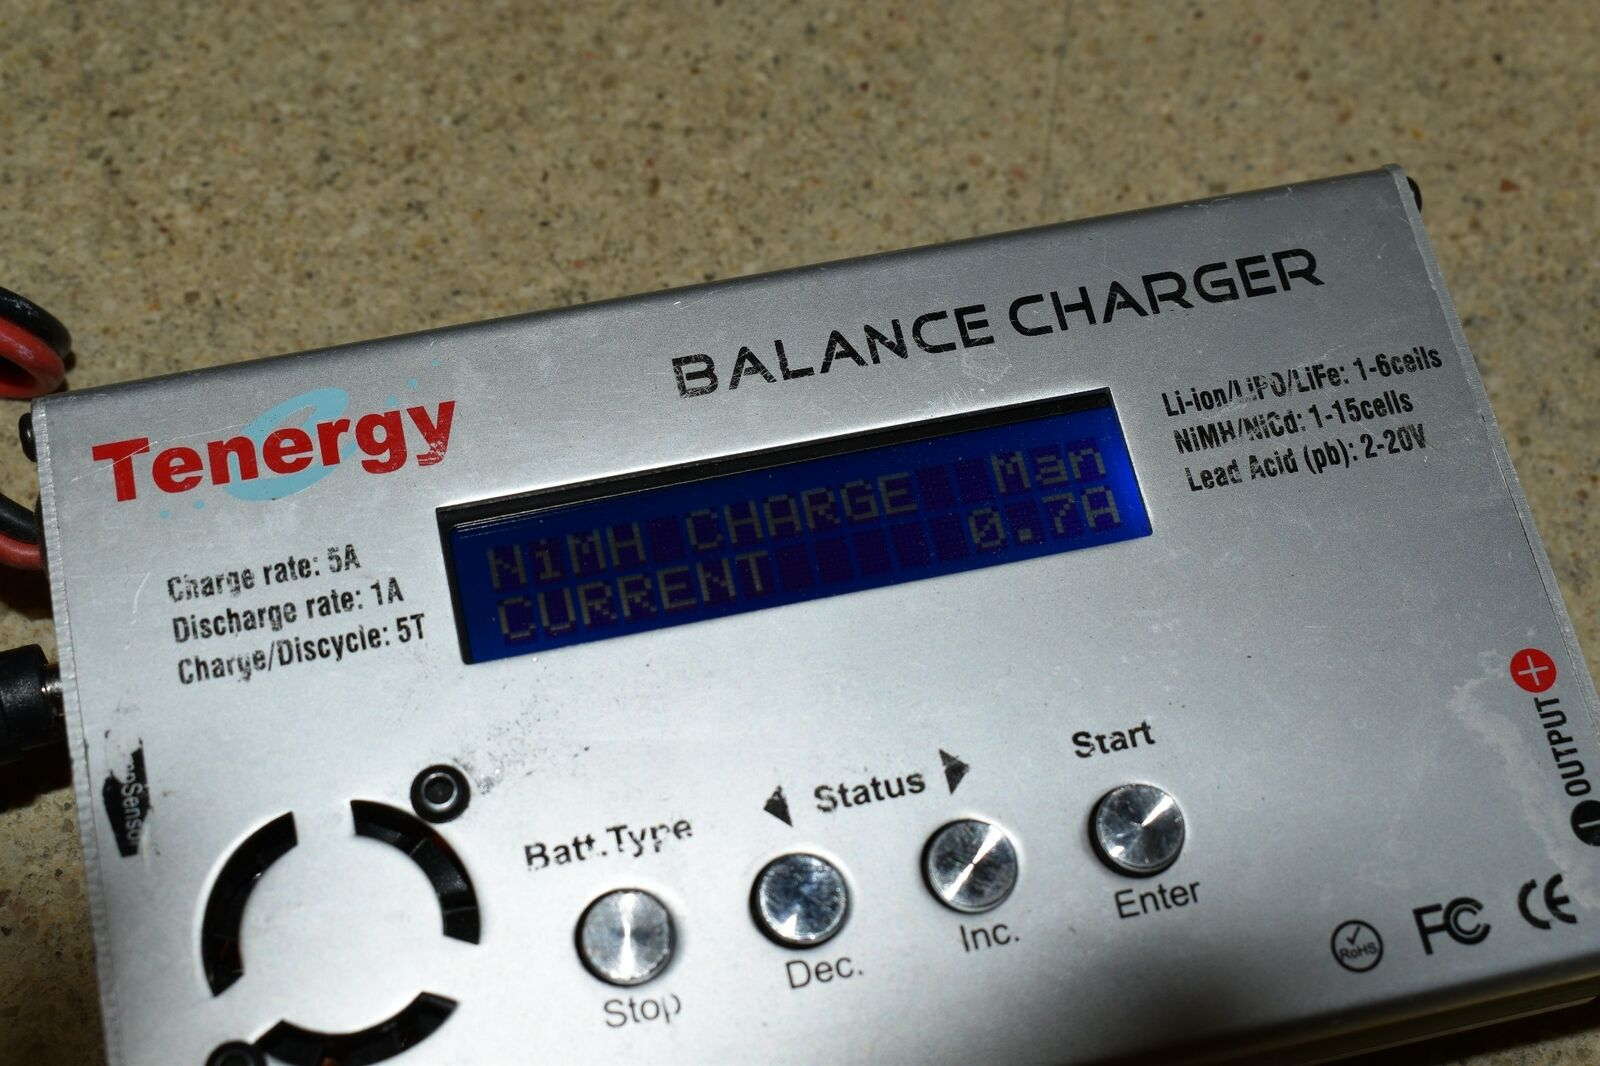 ^^ TENERGY BALANCE CHARGER